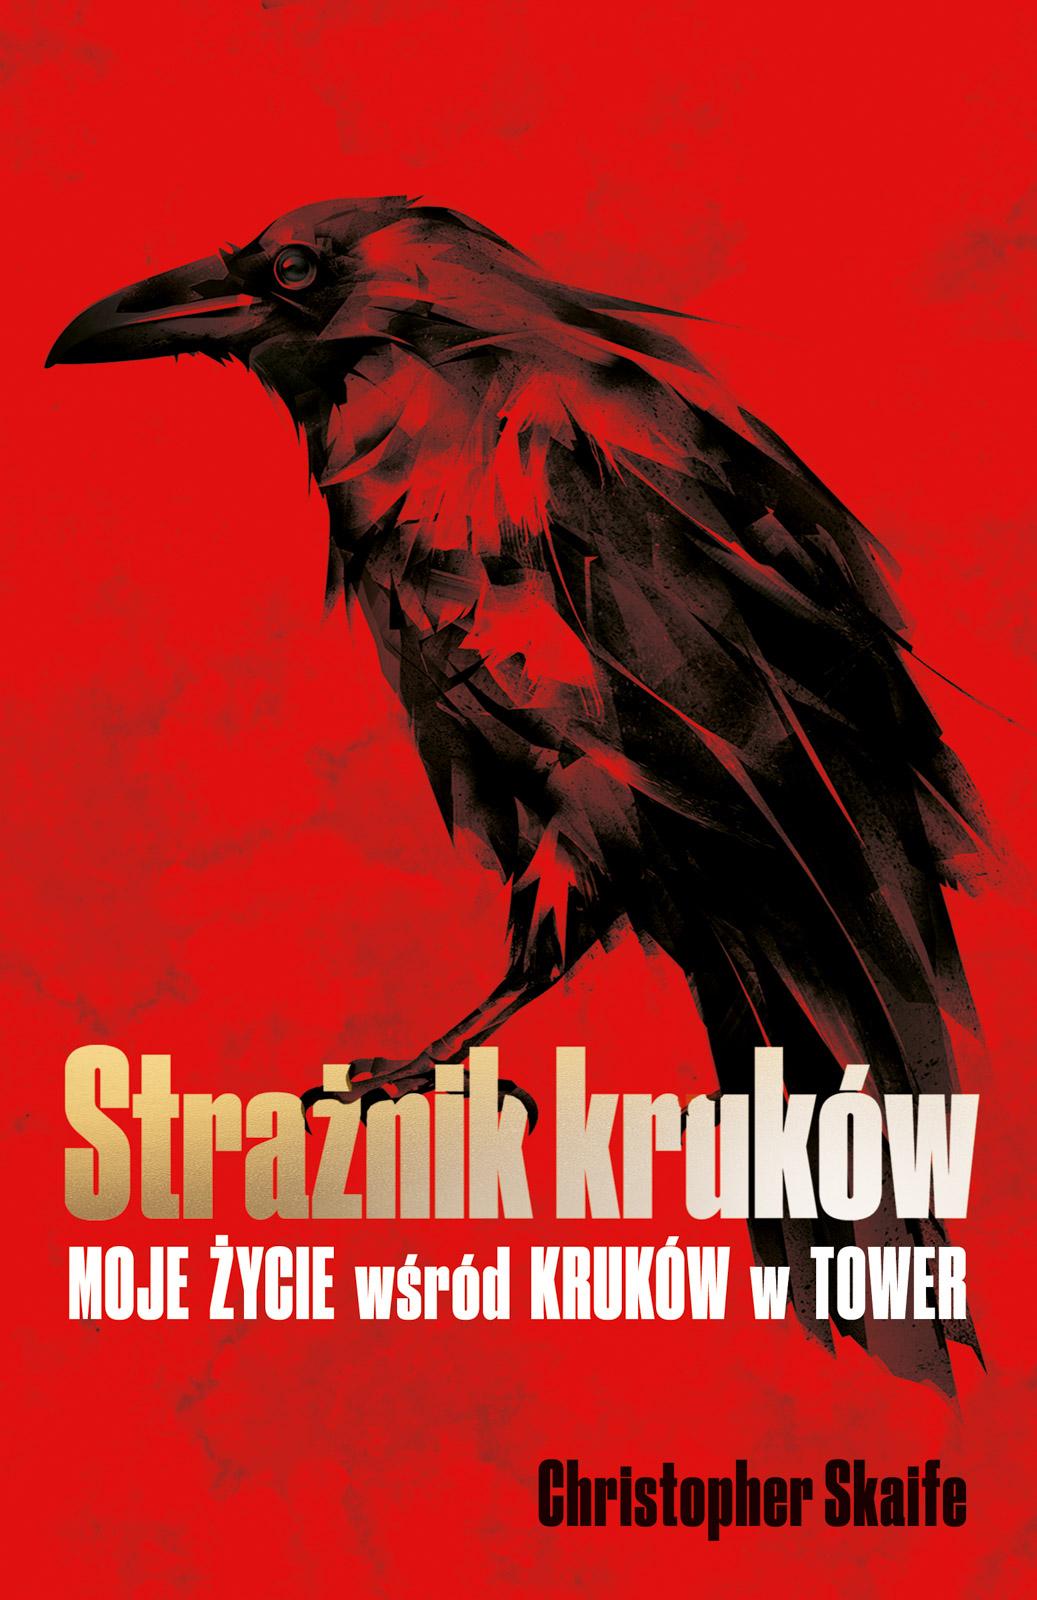 Skaife_Straznik_krukow okłądka